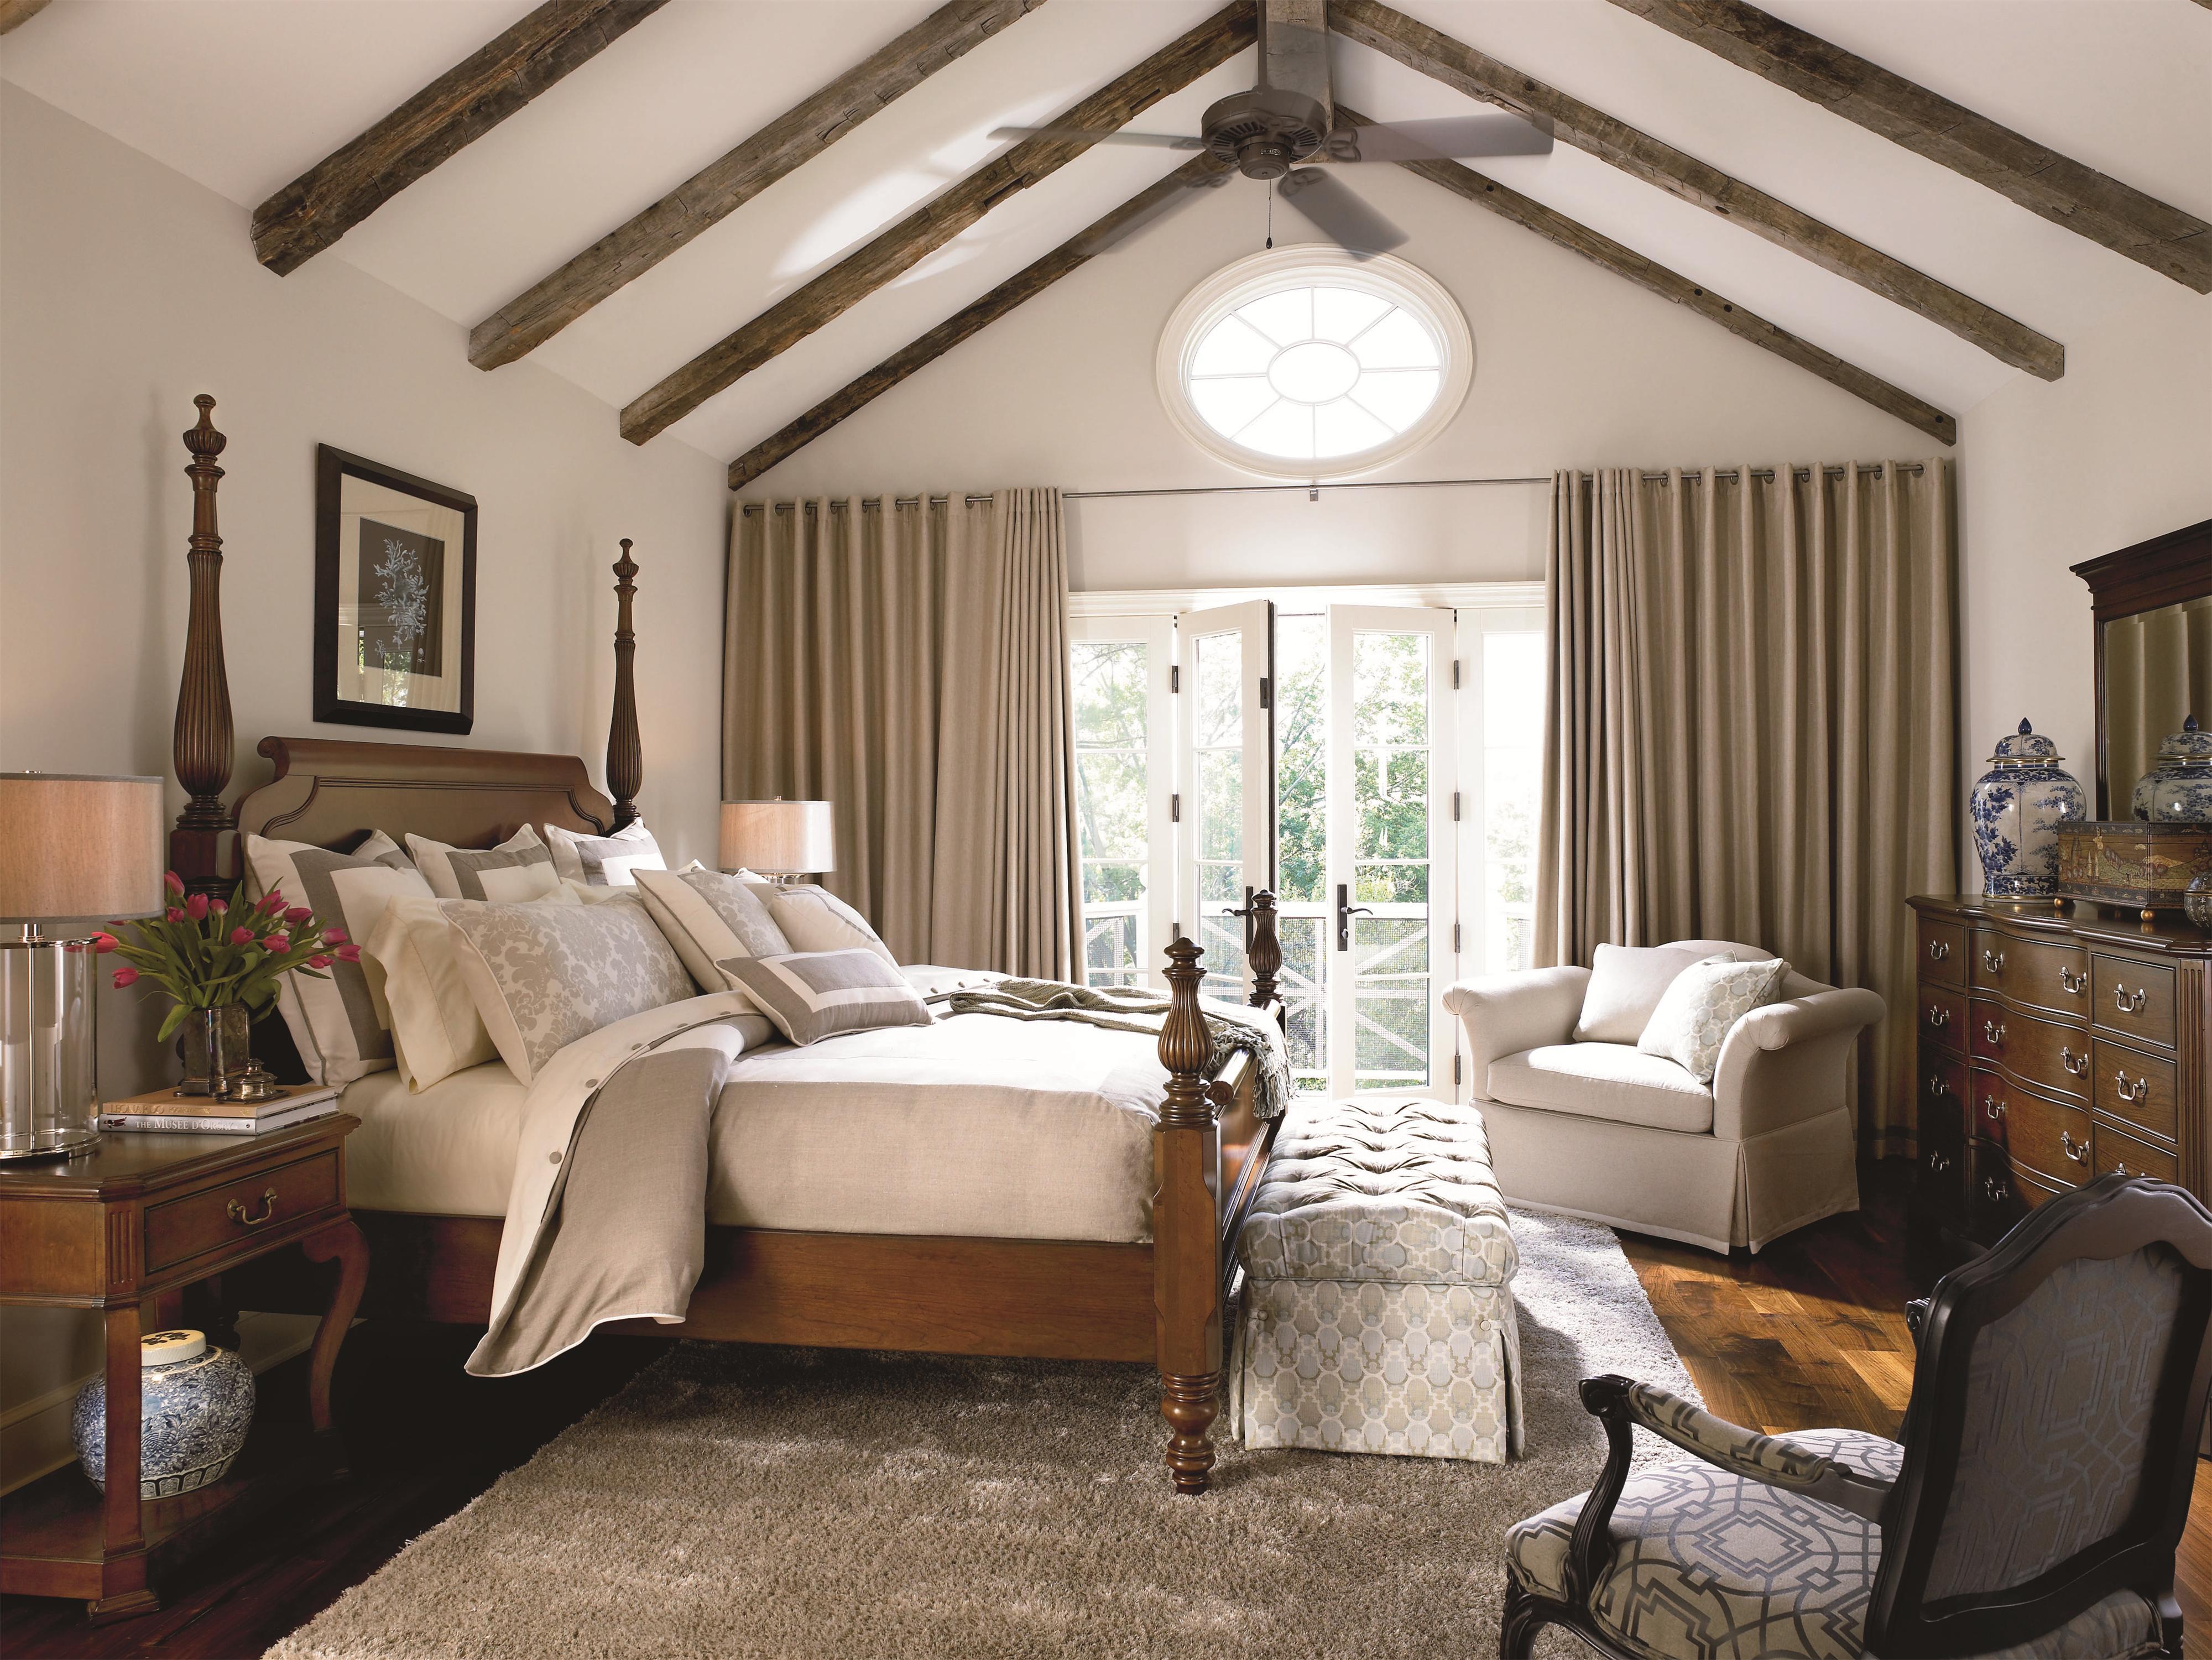 tate street by thomasville - Thomasville Bedroom Furniture